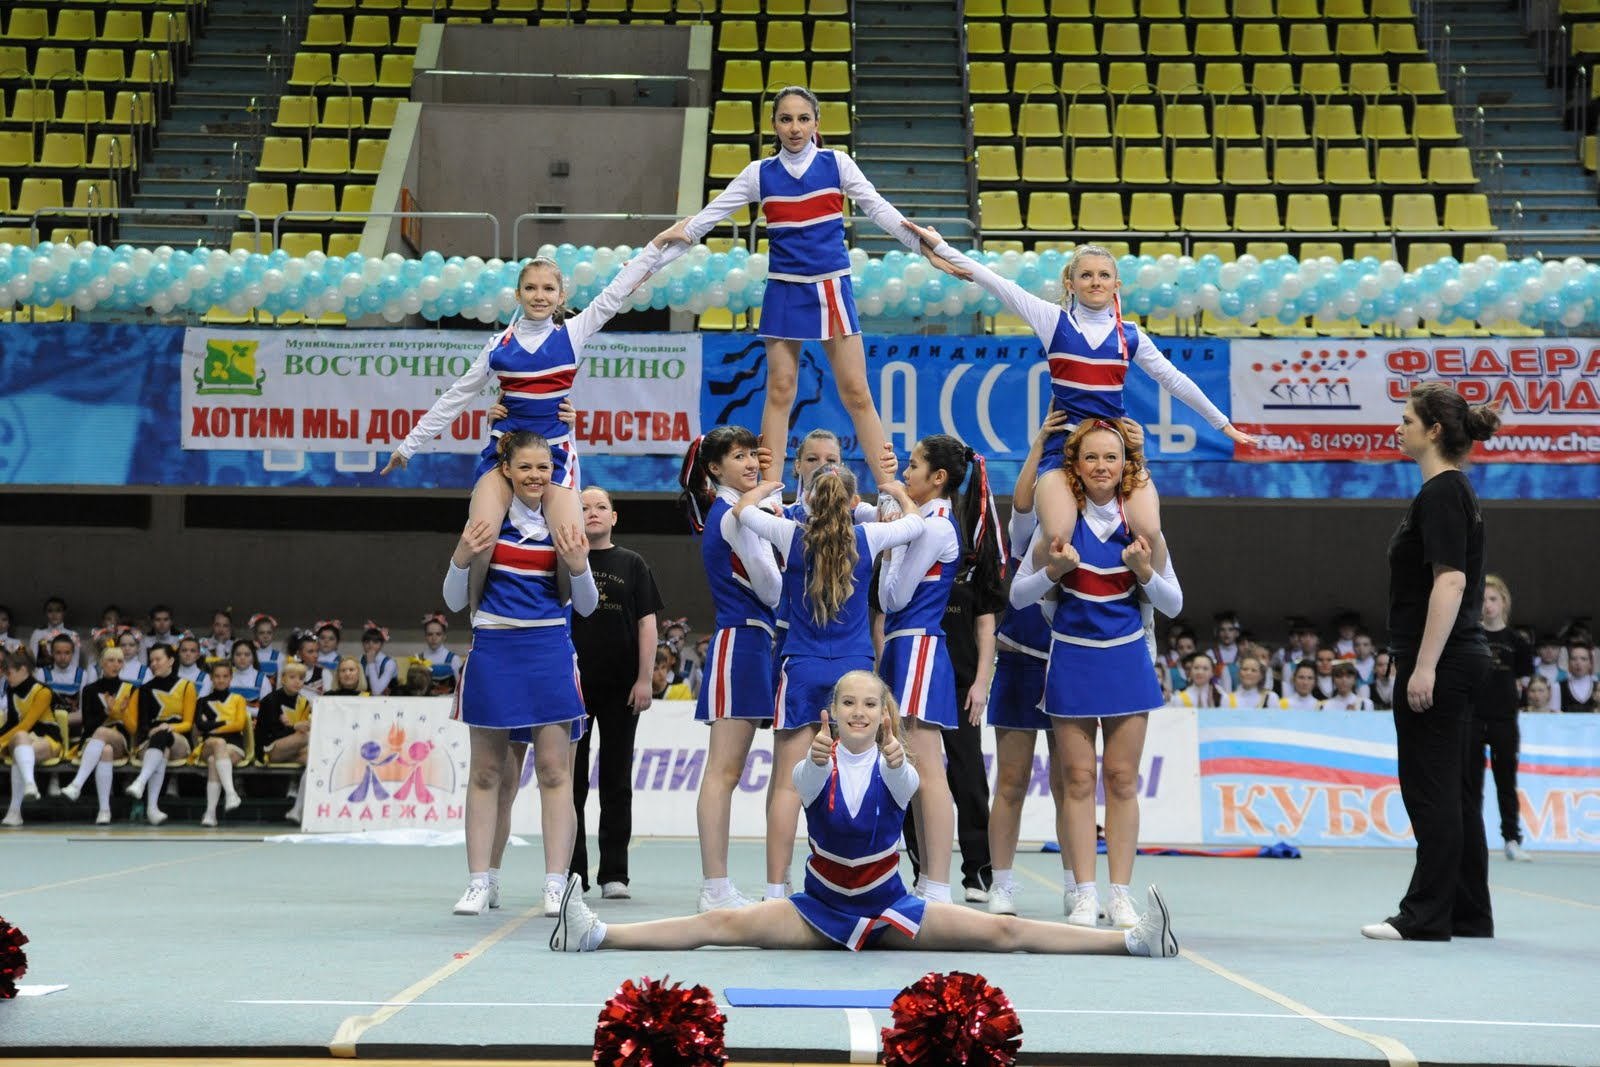 www.cheerleading.ru/